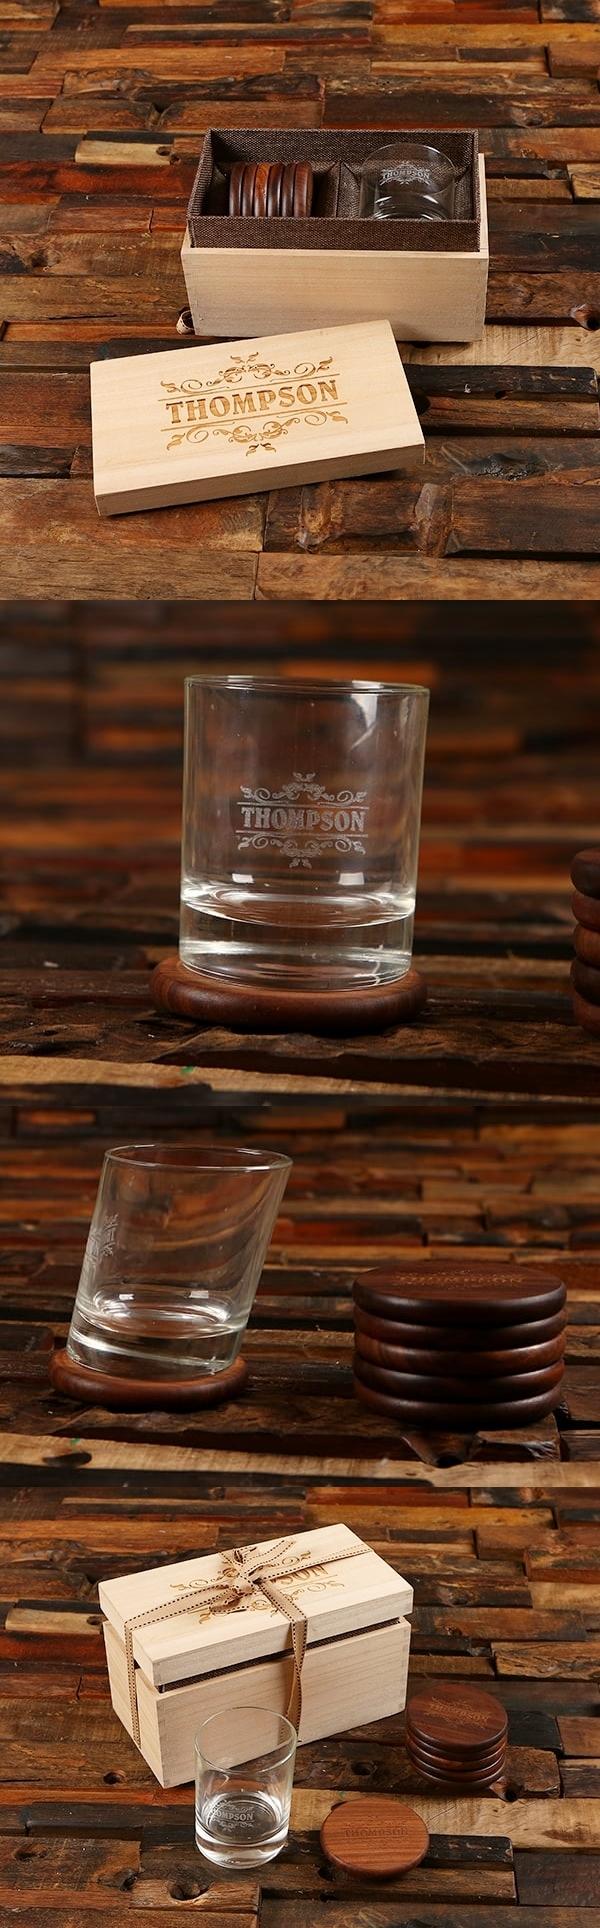 Personalized Slanted Rocks Glass, Walnut Coasters and Wood Gift Box